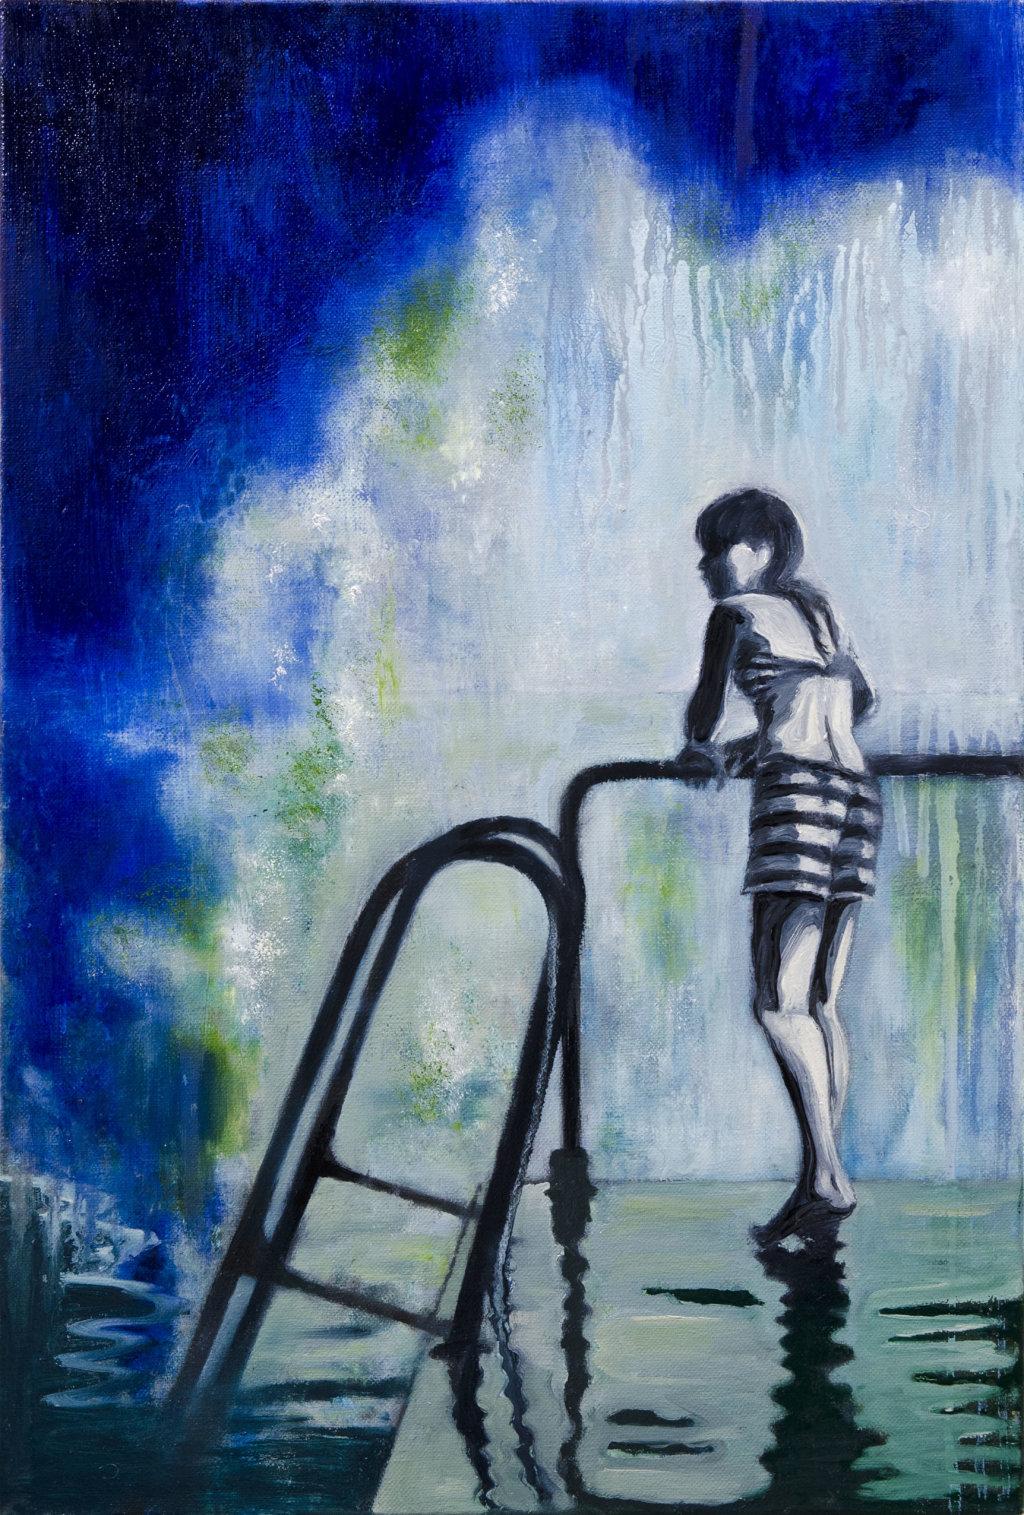 'The Edge of the Sea', 60 x 40 cm, oil on canvas